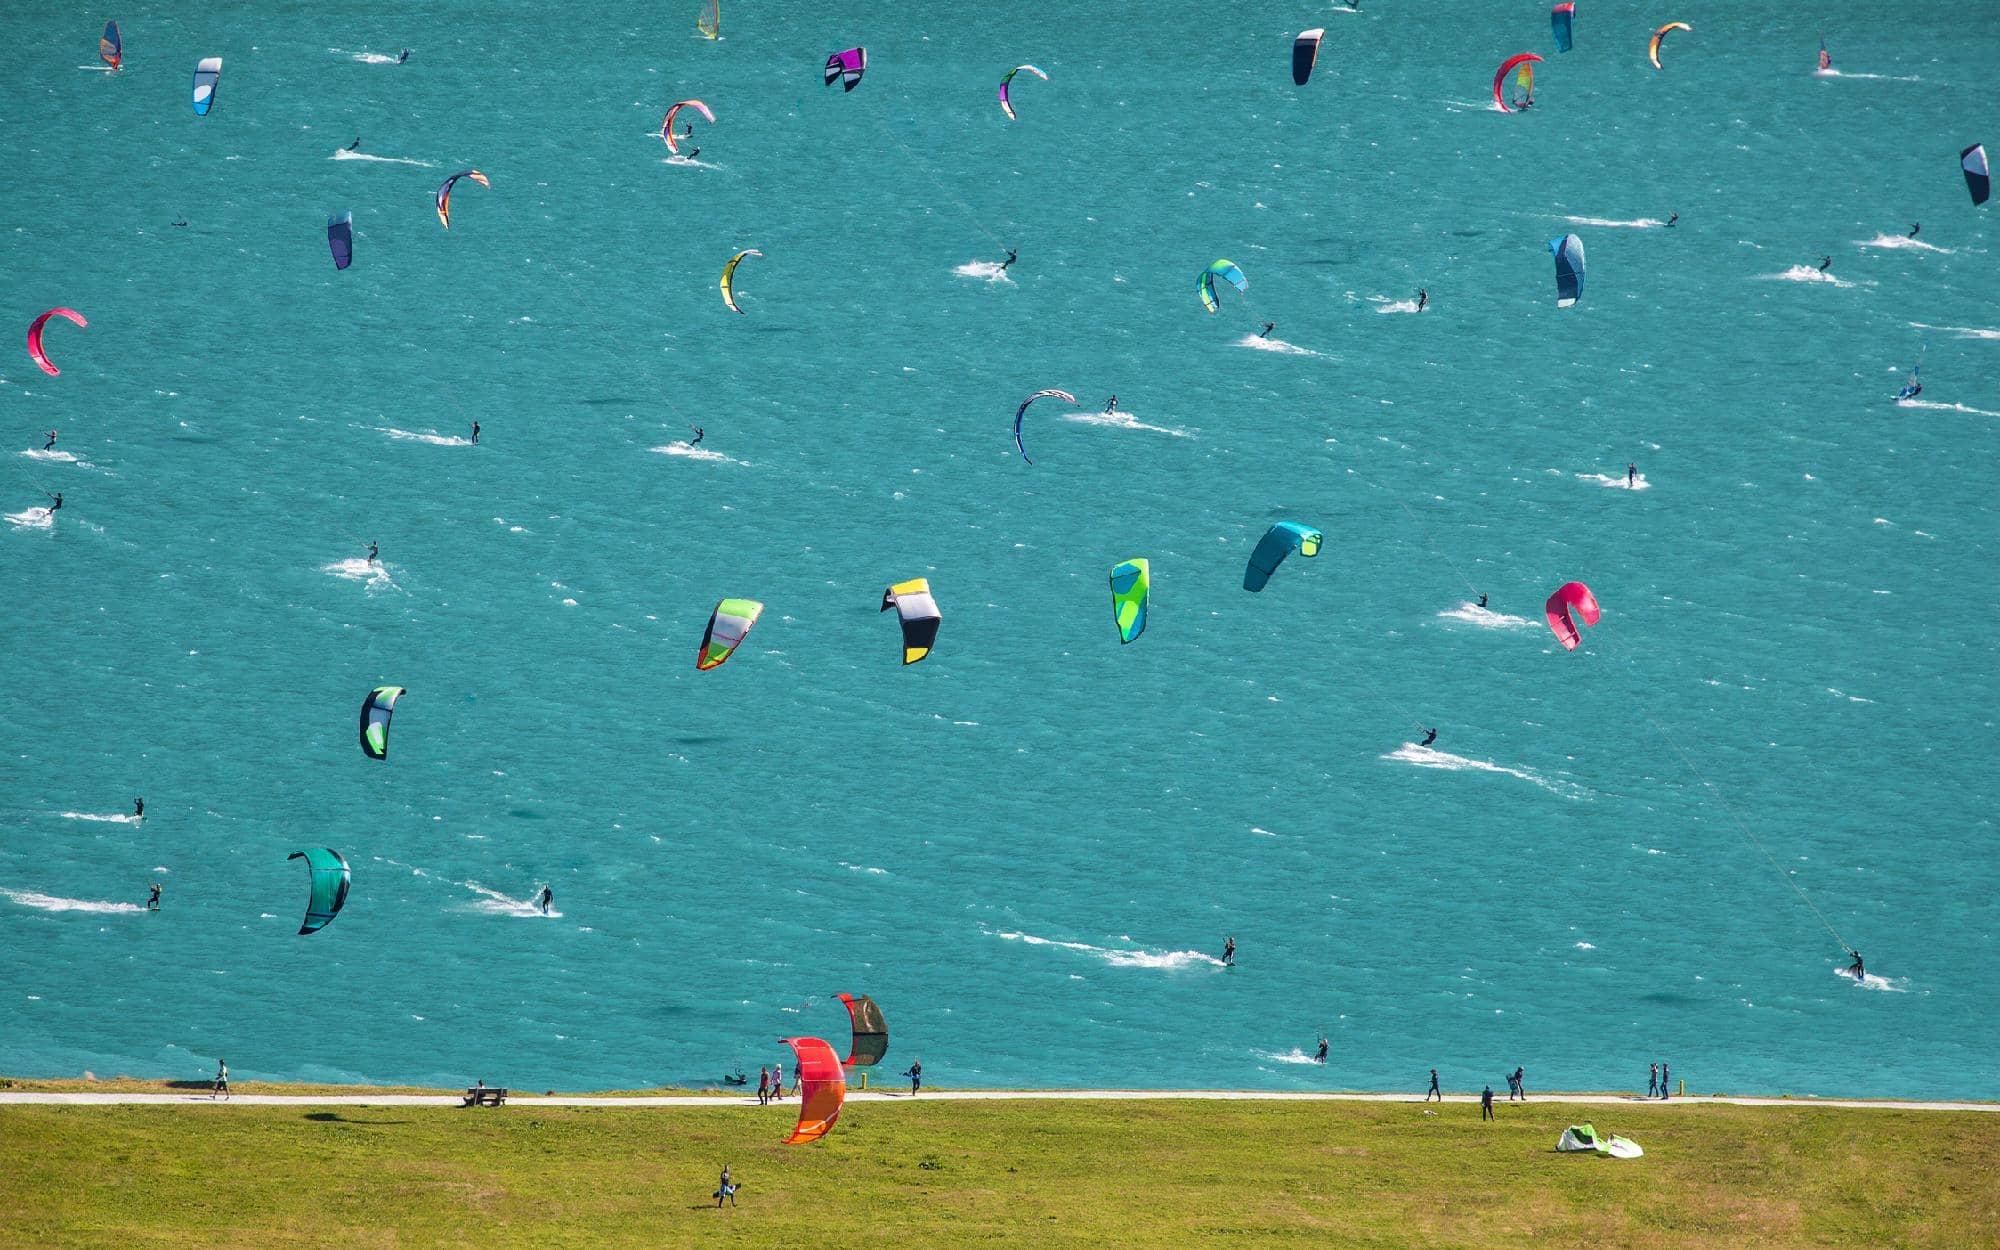 how-does-kitesurfing-work